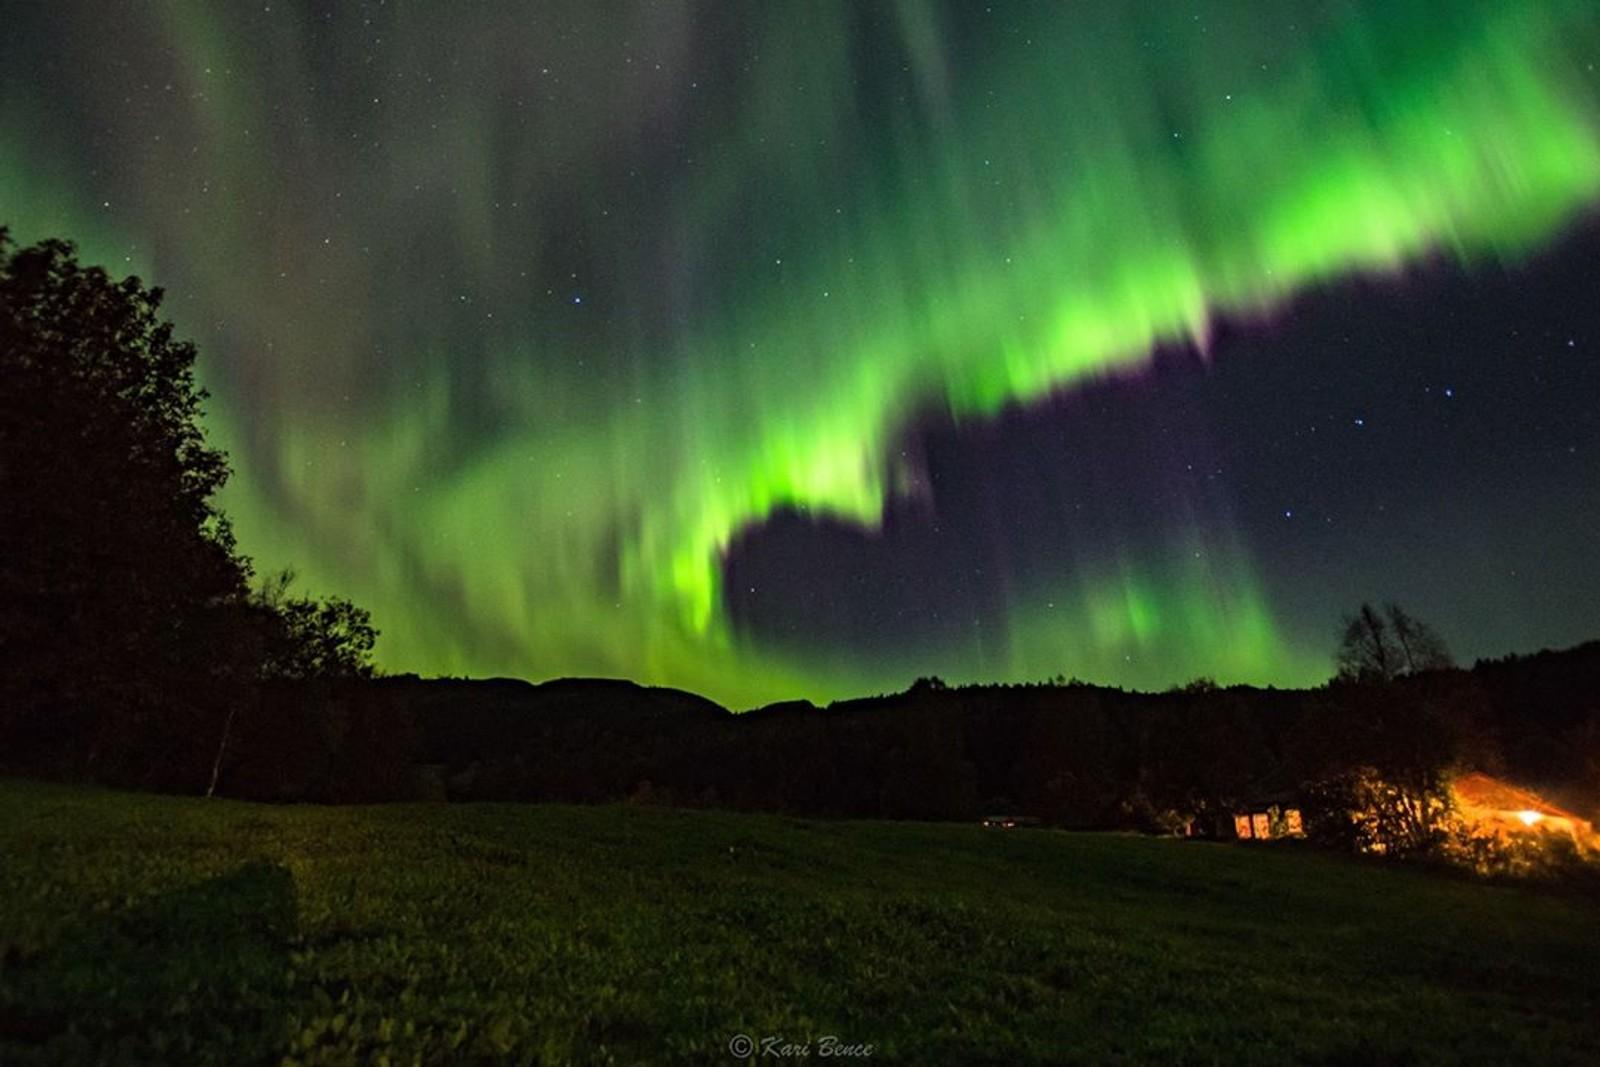 karibenceVakkert ute i natt... folk legger seg for tidlig :D #trollheimsporten #utno #essence_of_norway #thebestofscandinavia #turistforeningen #nrkmogr #nikon_d7200 #nikon_landscape #nikonnordic #nikon_dslr_users #nightshooters #earthgallery #worldaurora #solarstorm #nightskies #aurora #breathtaking #spectacular #nightsky #nightphotography #nature #nightshots #astrophotography